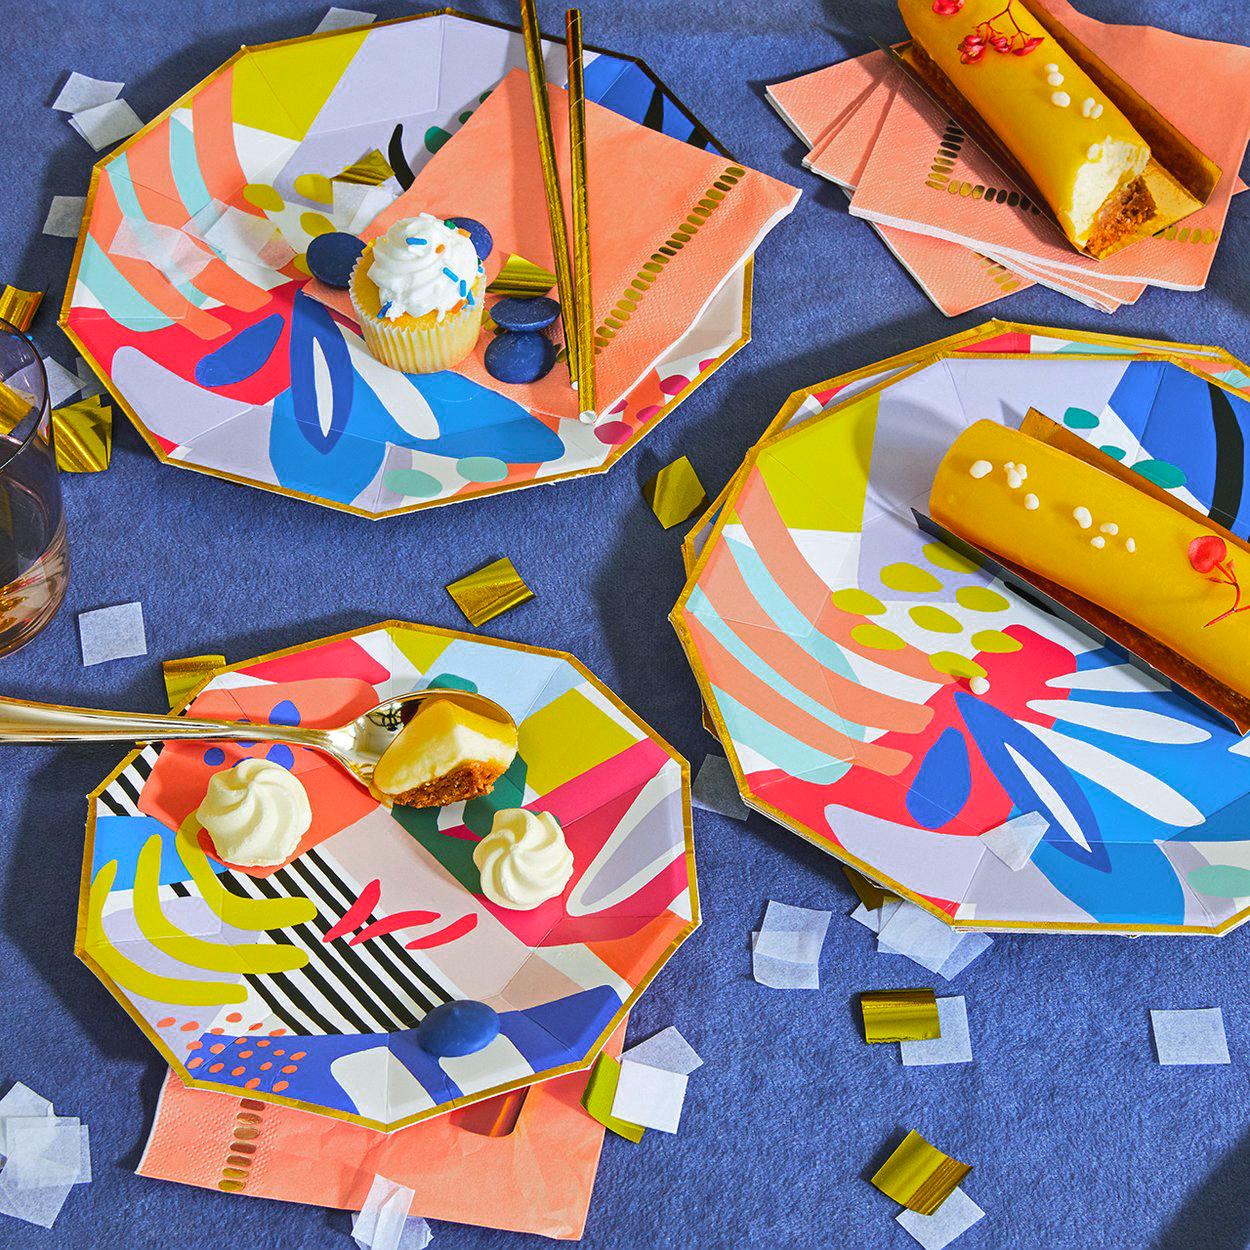 Matisse plates 2.jpg